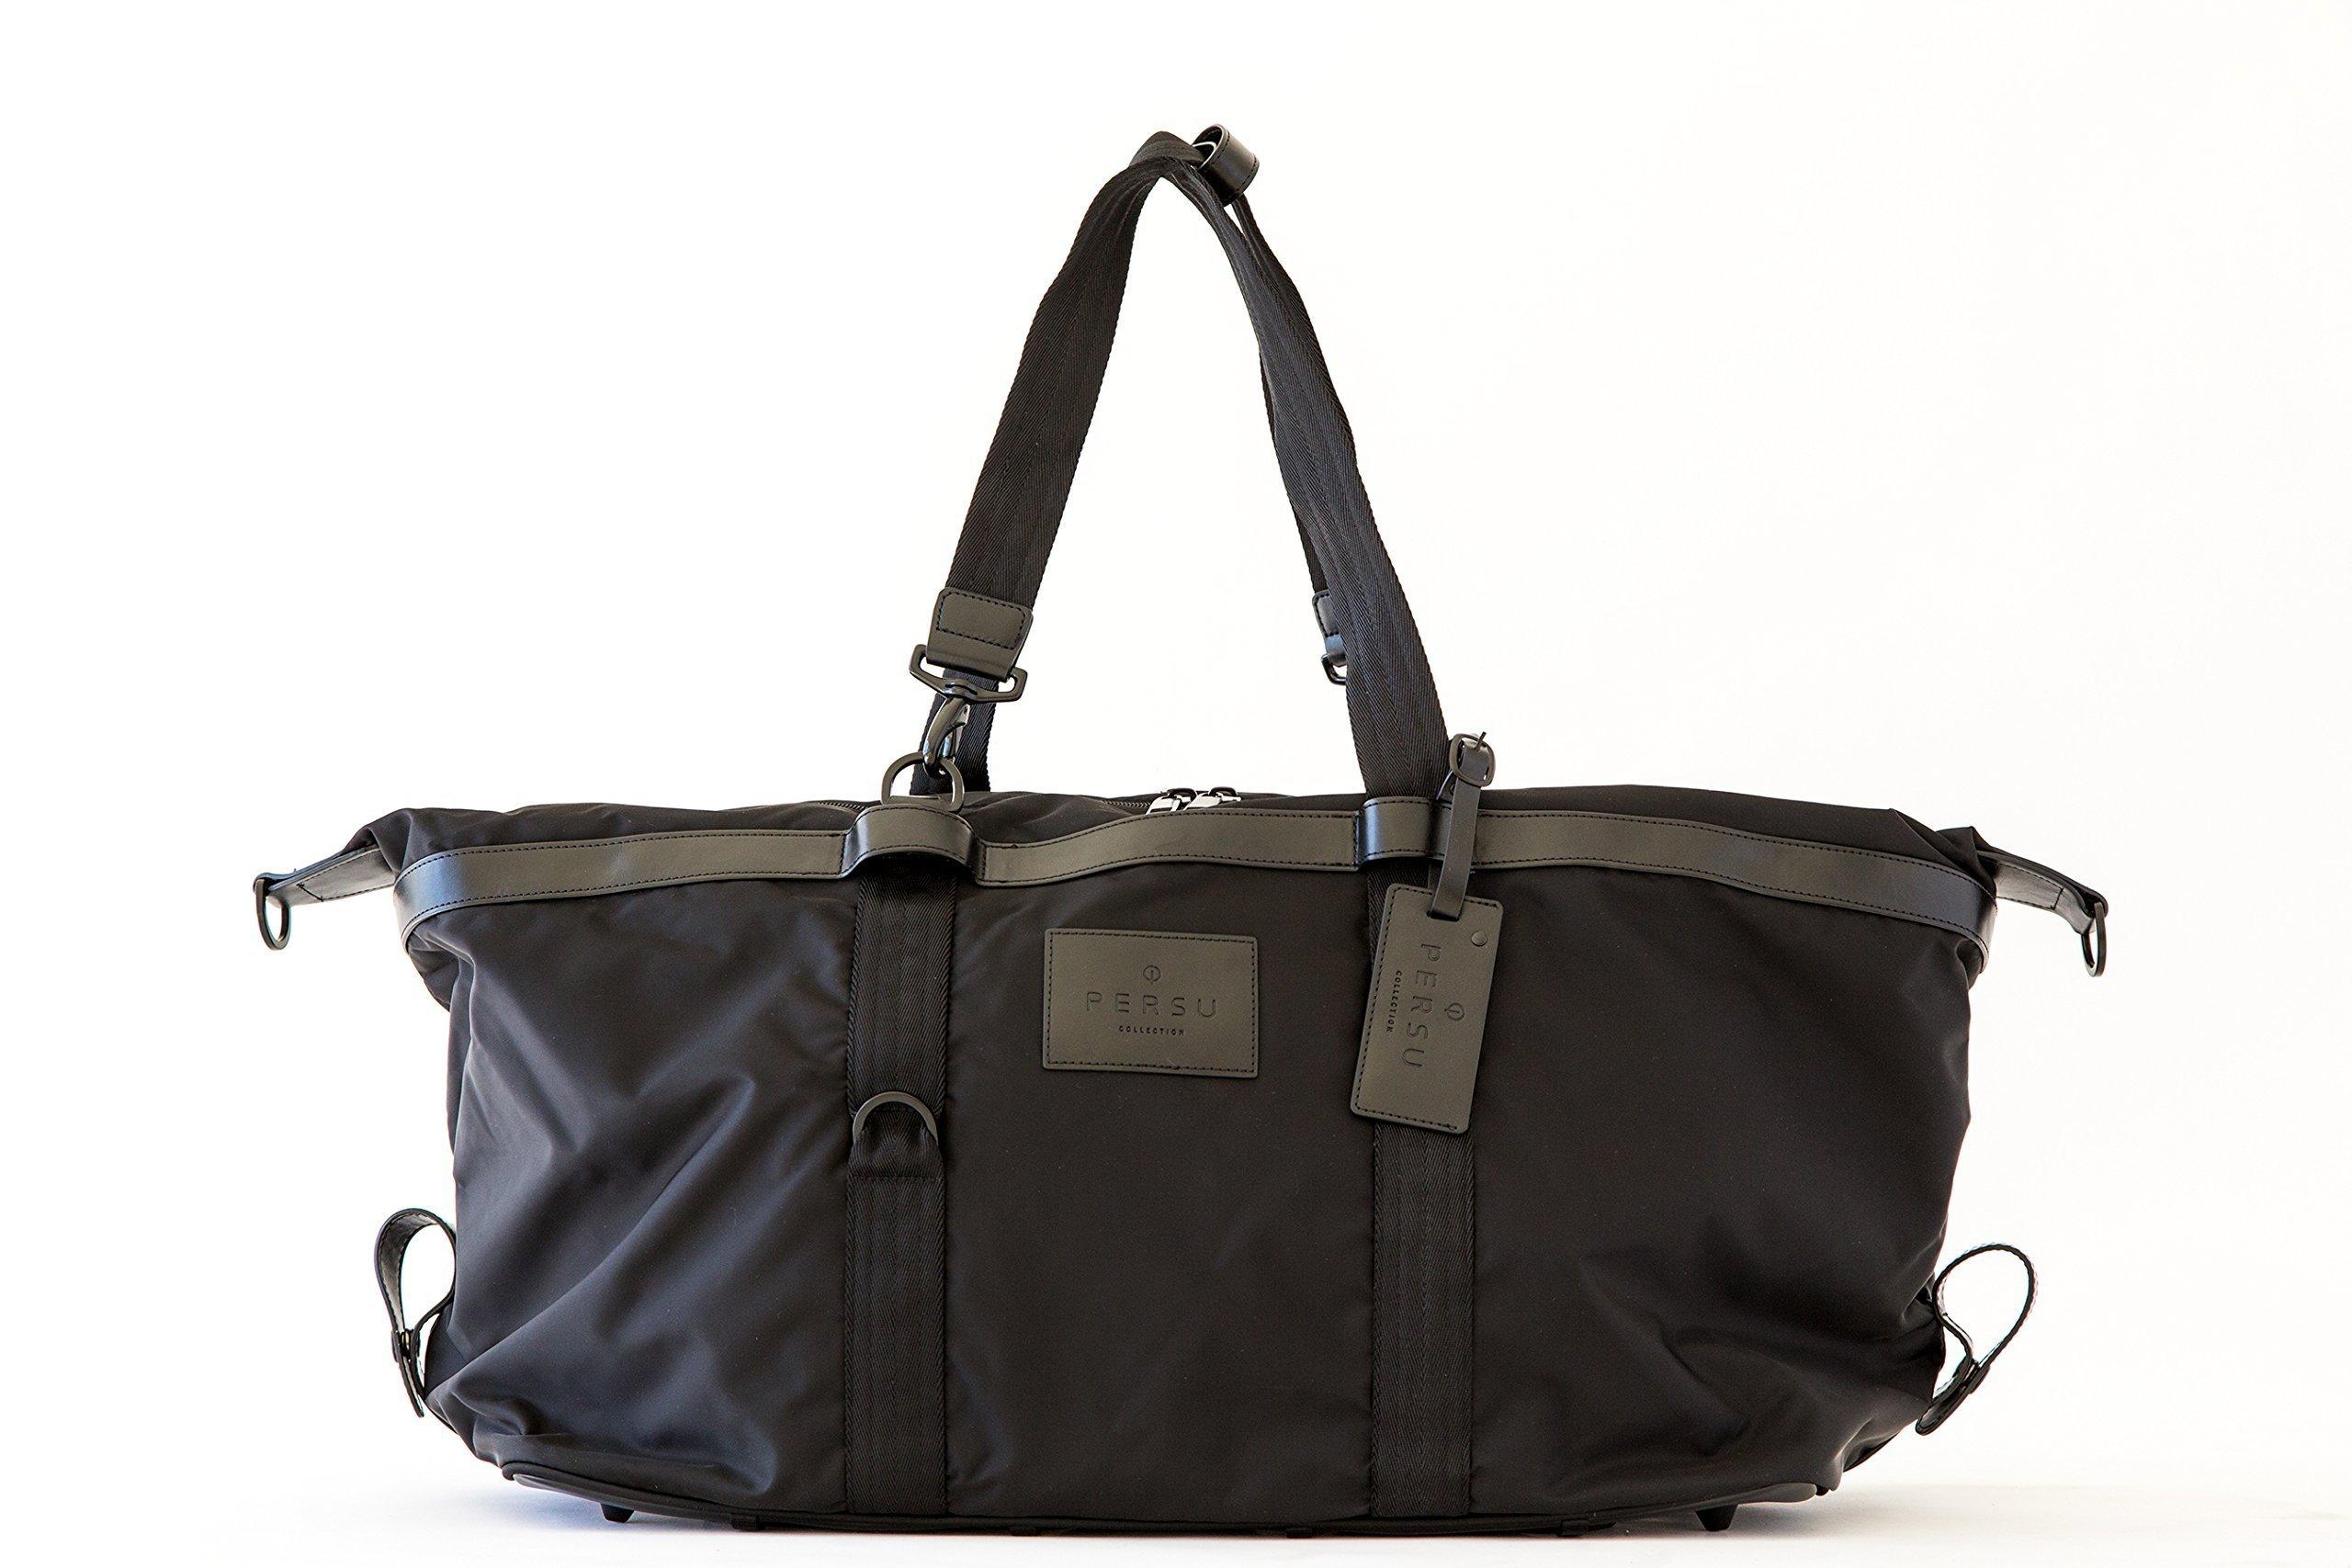 PERSU COLLECTION Men's/Unisex Gym and Weekender Bag - Black